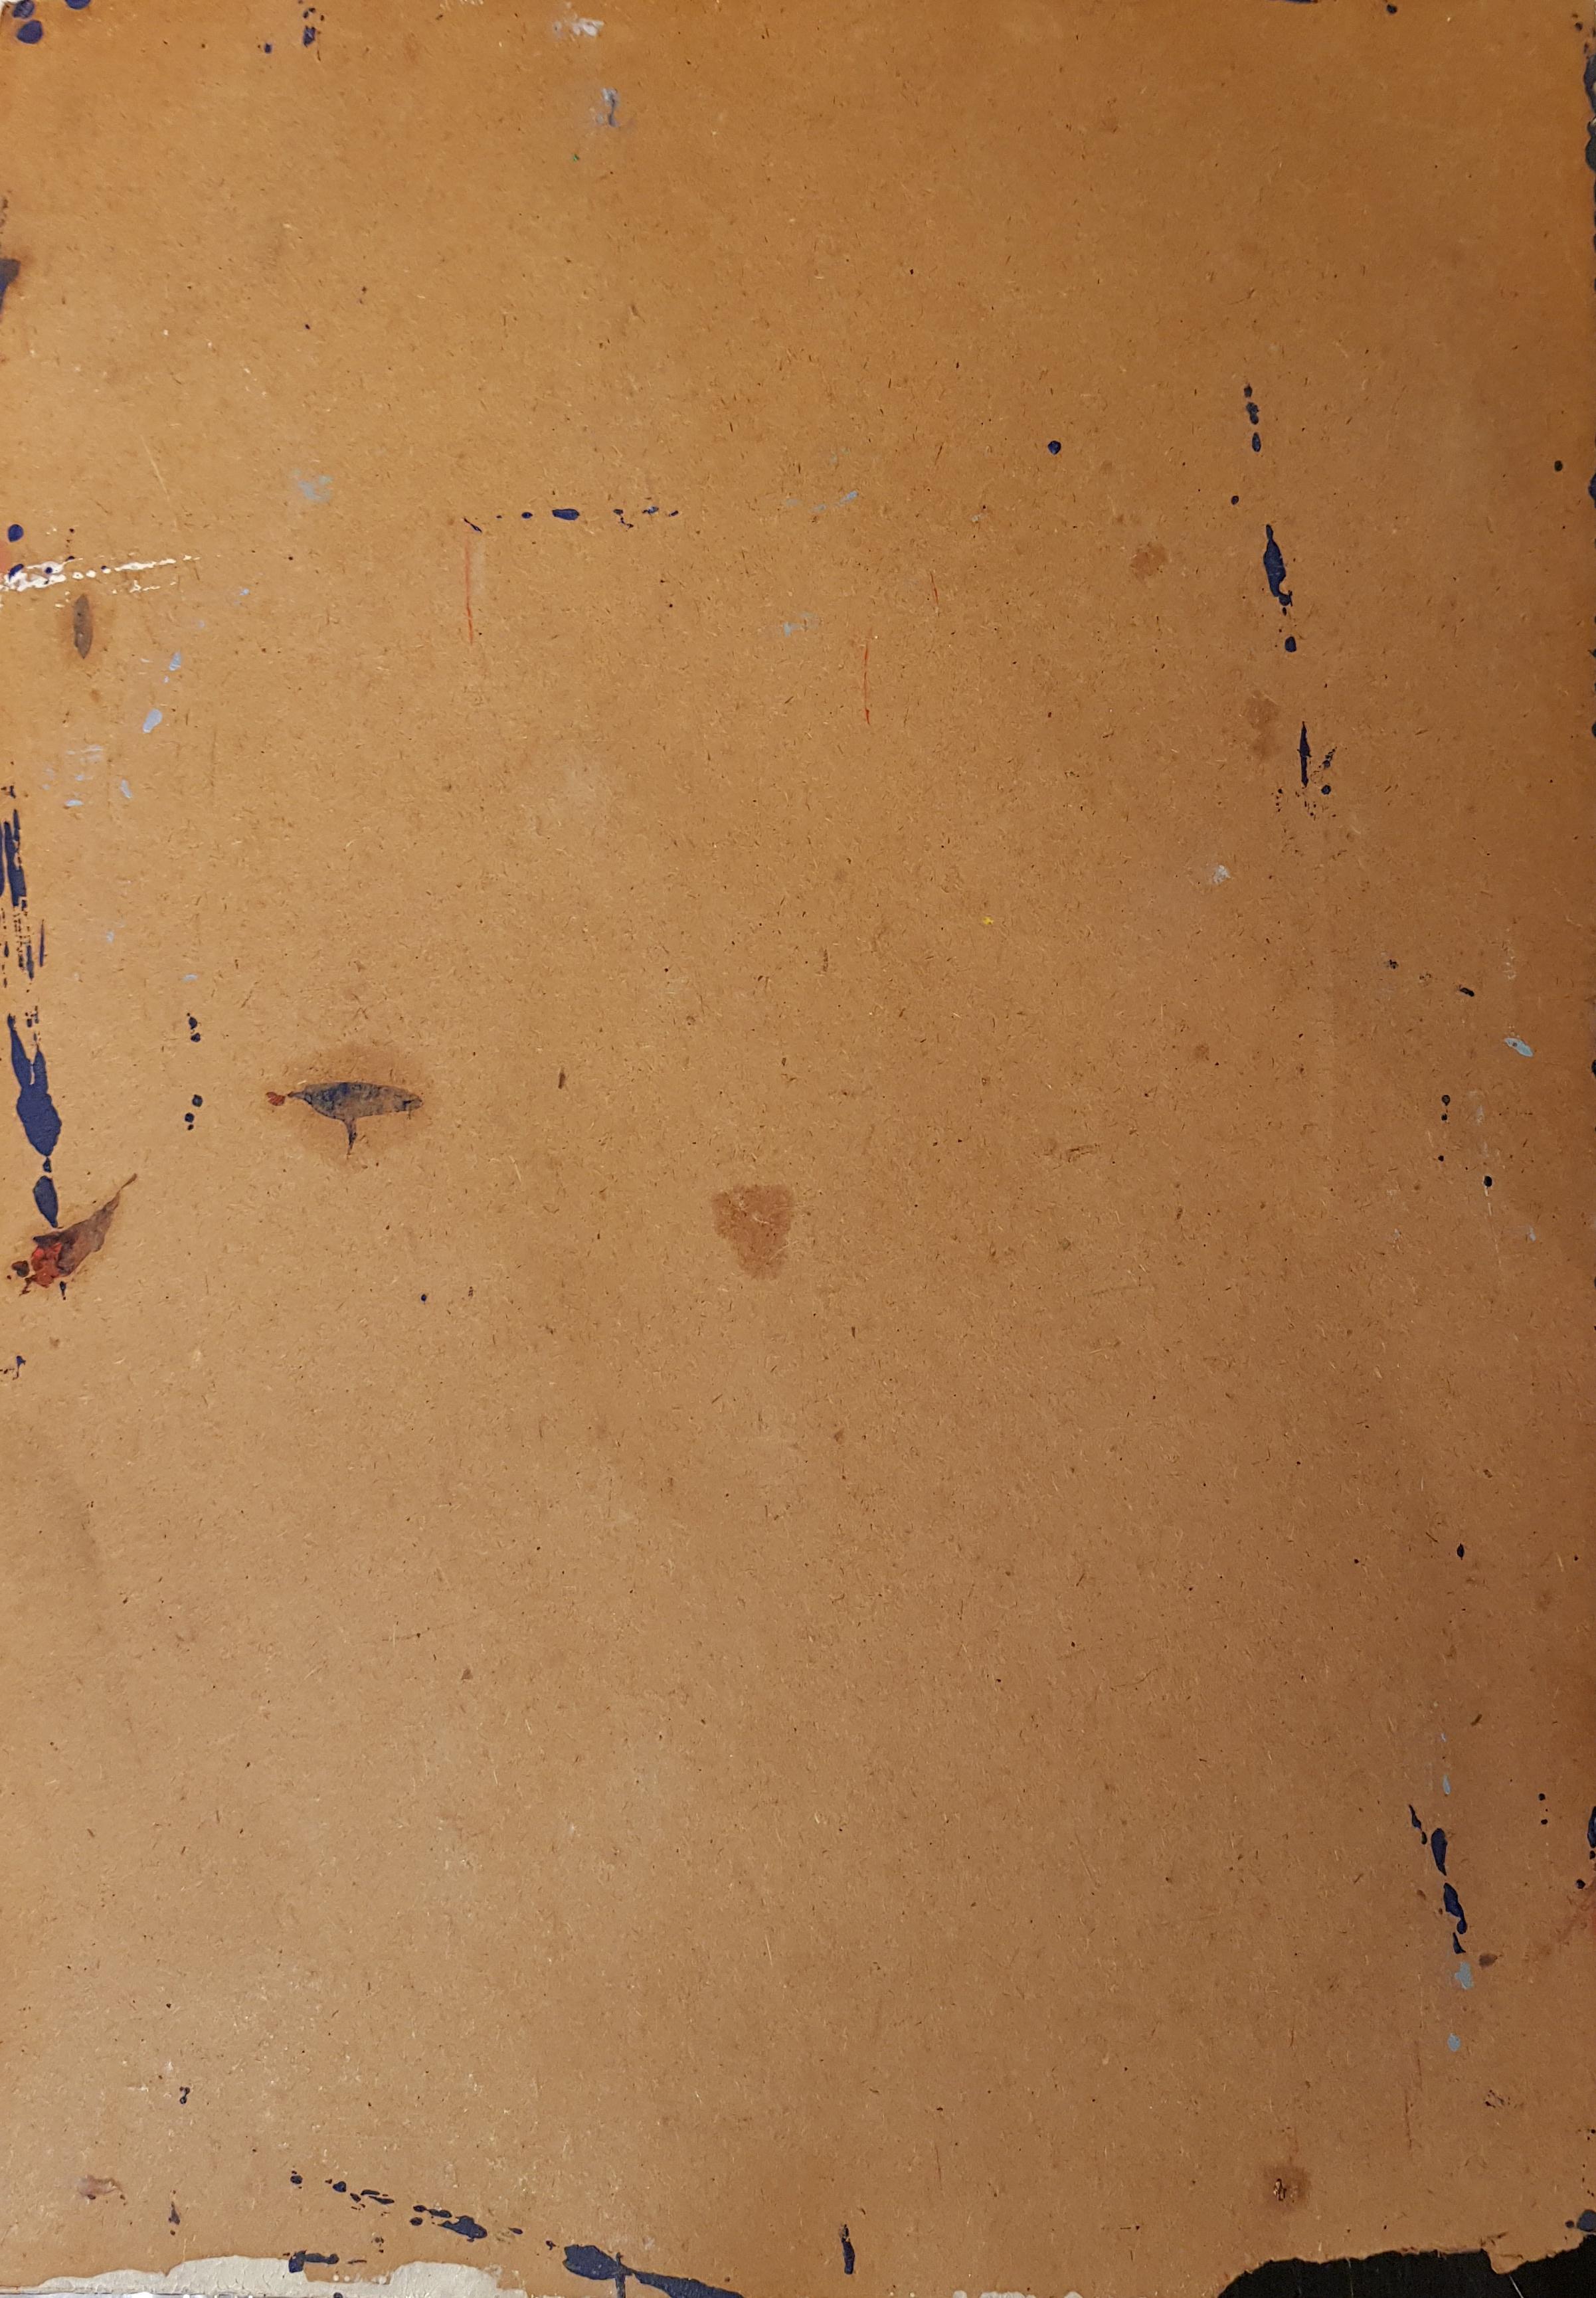 Оборот. Зубарев Владислав Константинович. Портрет девушки на синем фоне